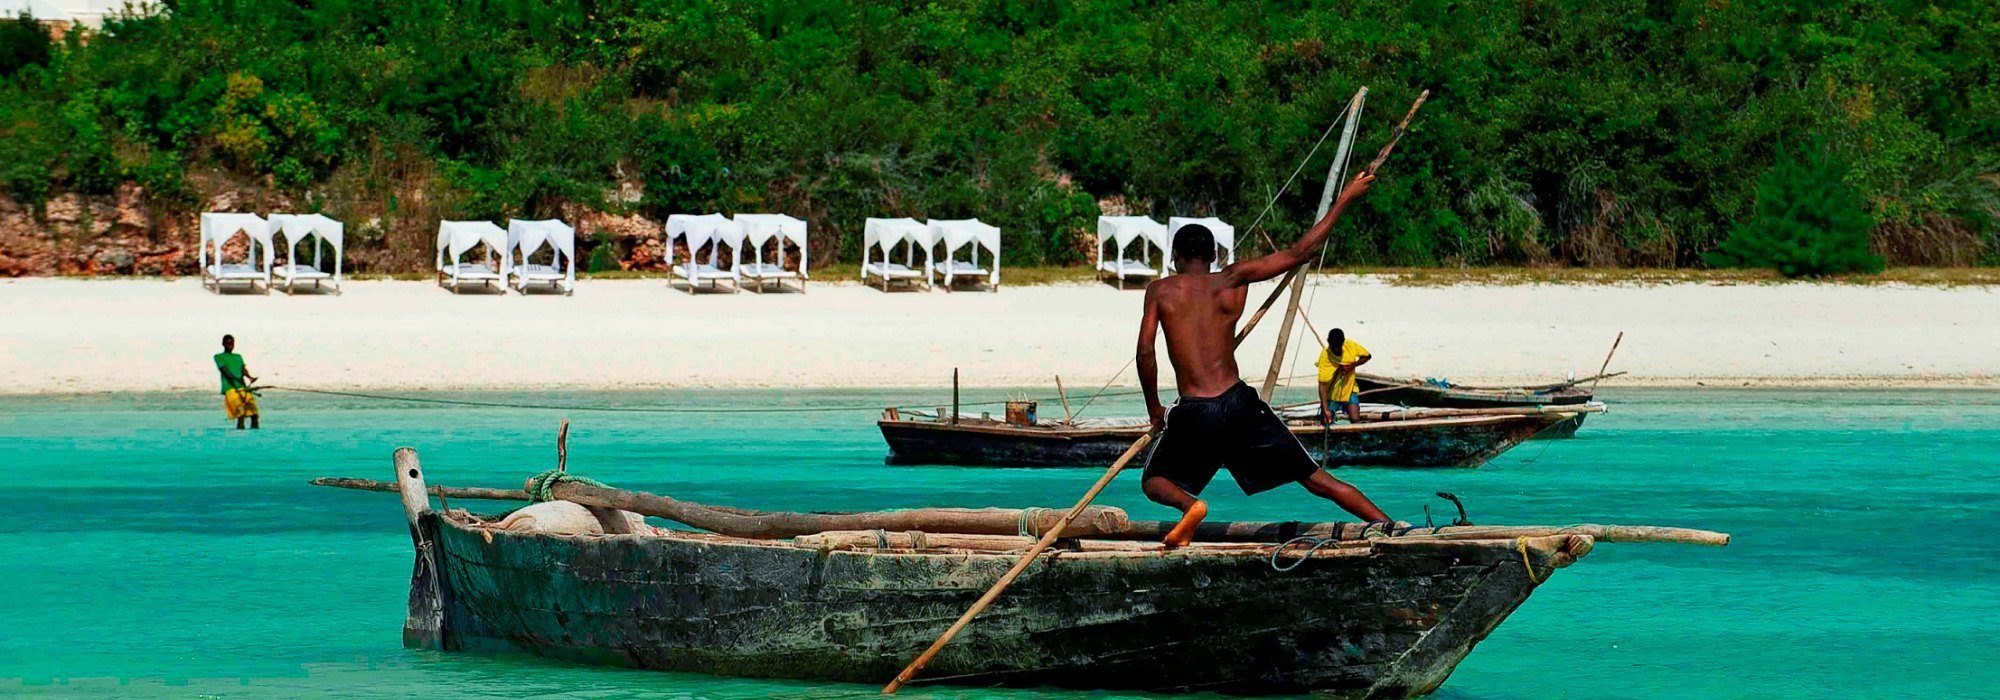 Zanzibar Fisherman at Kilindi